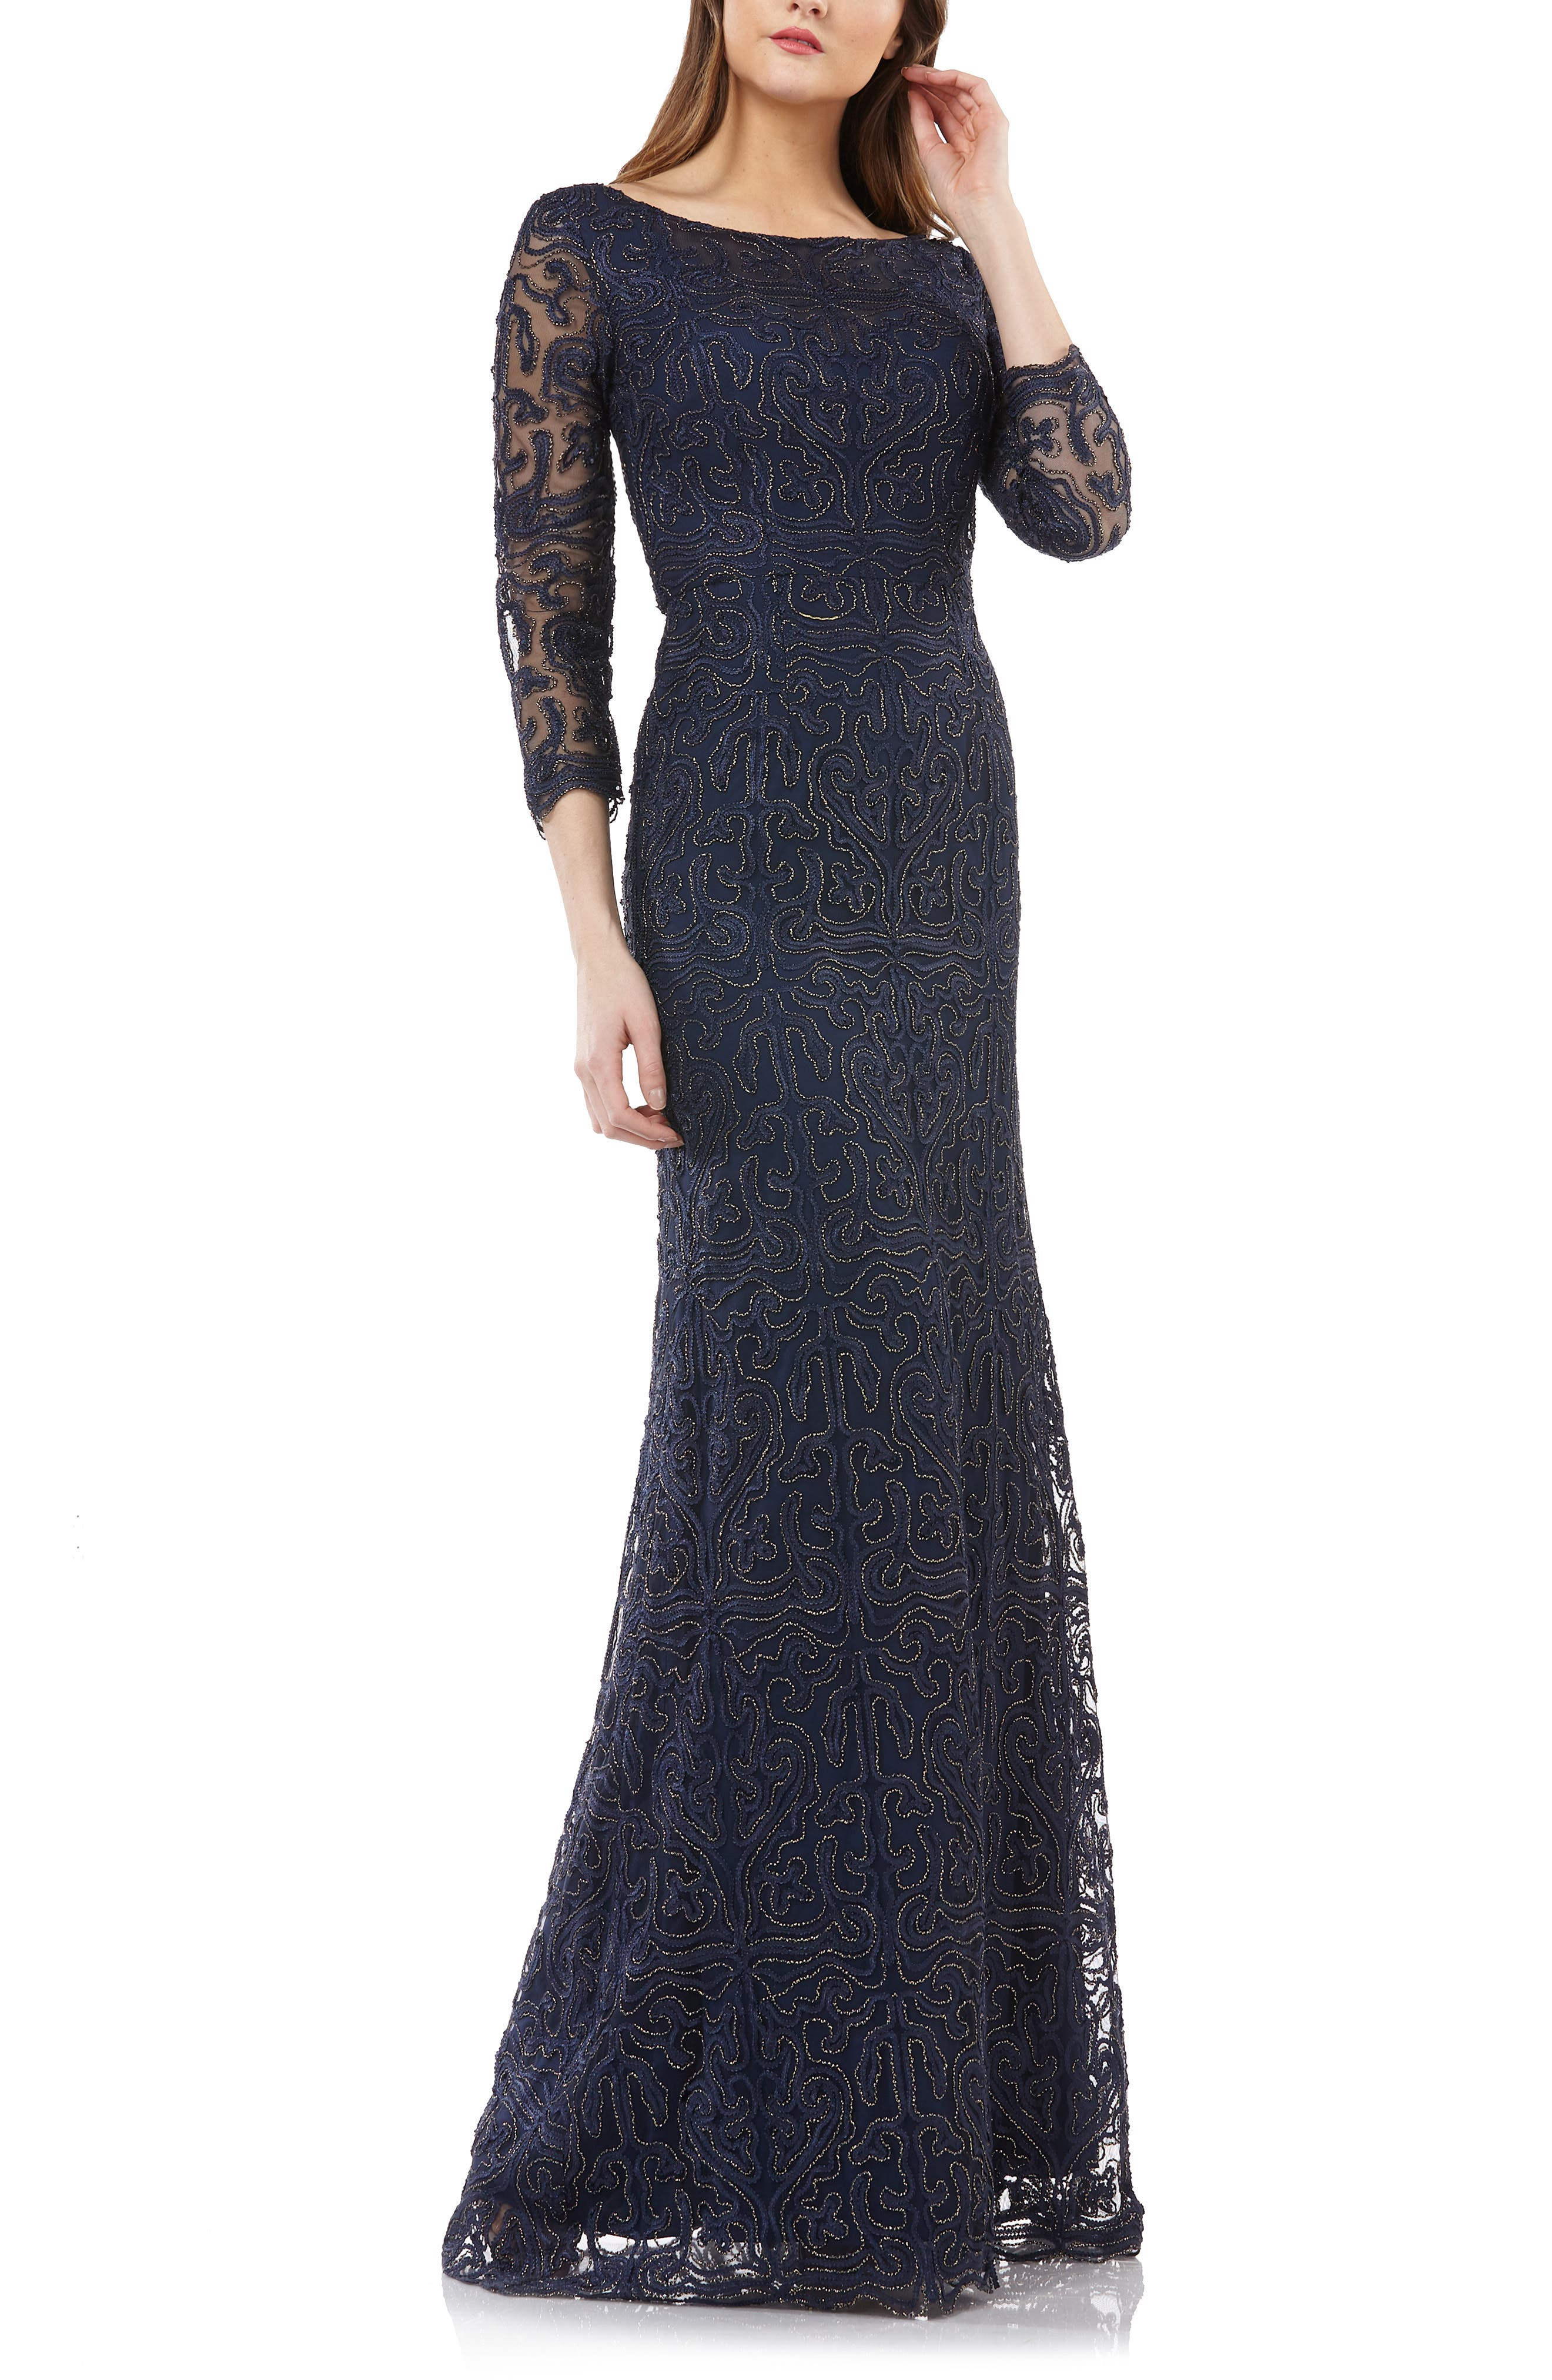 Metallic Soutache Evening Dress,                             Main thumbnail 1, color,                             NAVY/ GOLD